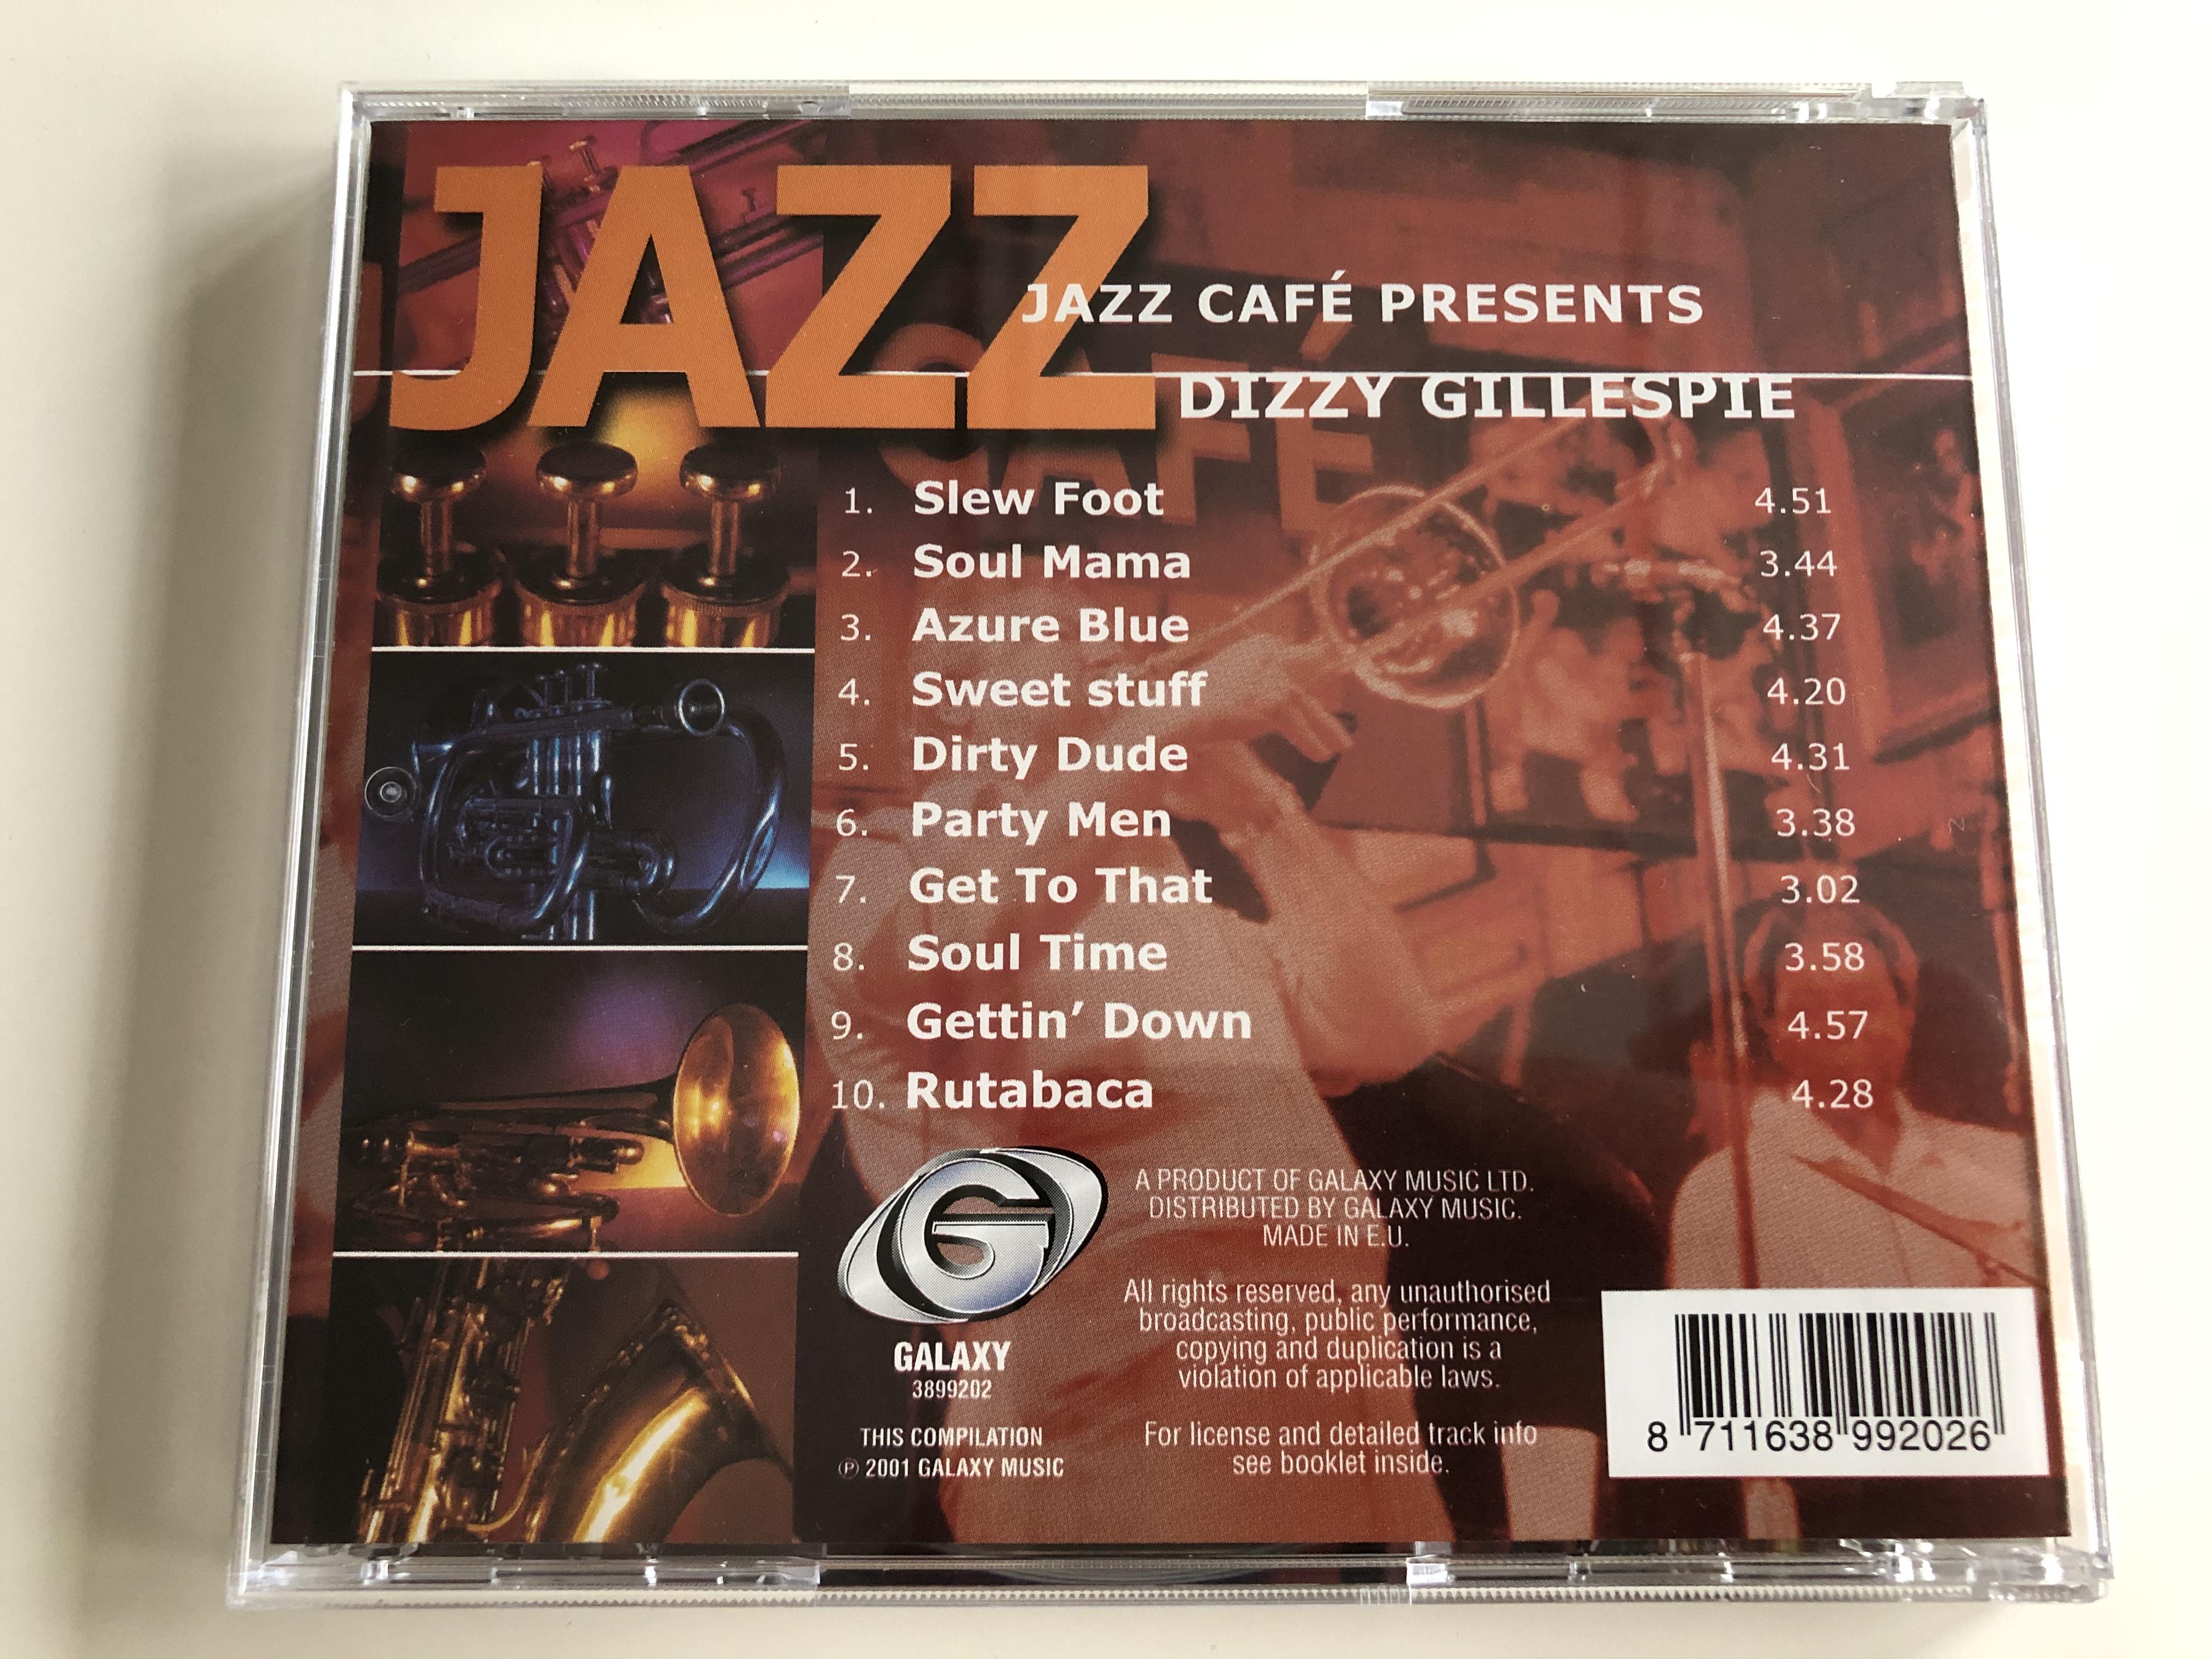 jazz-caf-presents-dizzy-gillespie-audio-cd-2001-galaxy-music-3899202-4-.jpg